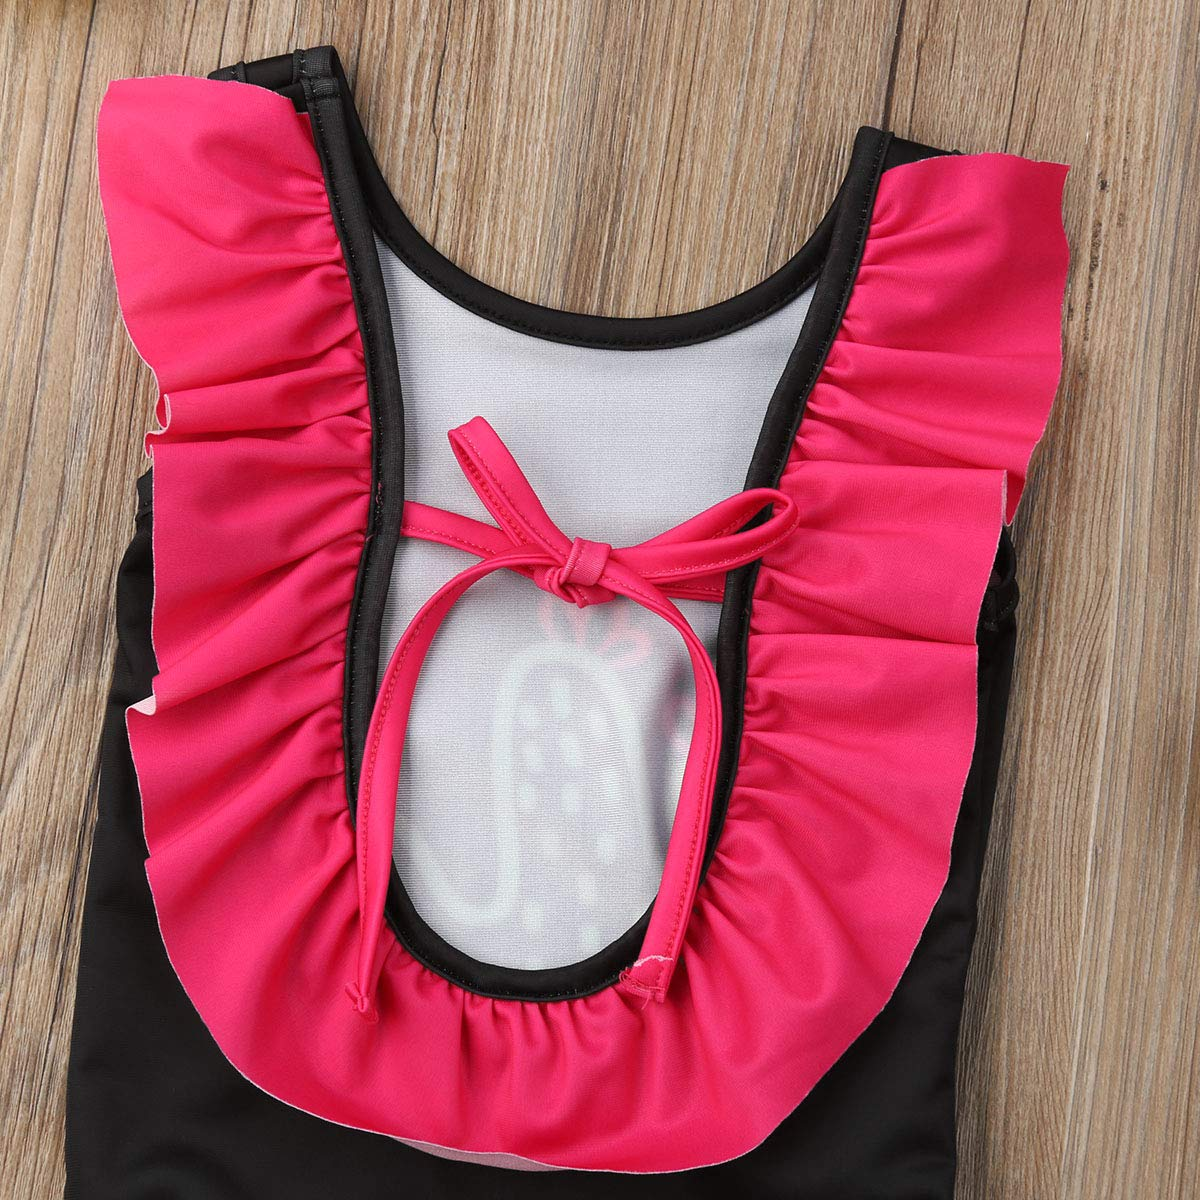 Wallarenear Kids Baby Girls Cactus One Piece Swimsuit Adjustable Bandage Sleeveless Swimwear Beachwear Bathing Suit